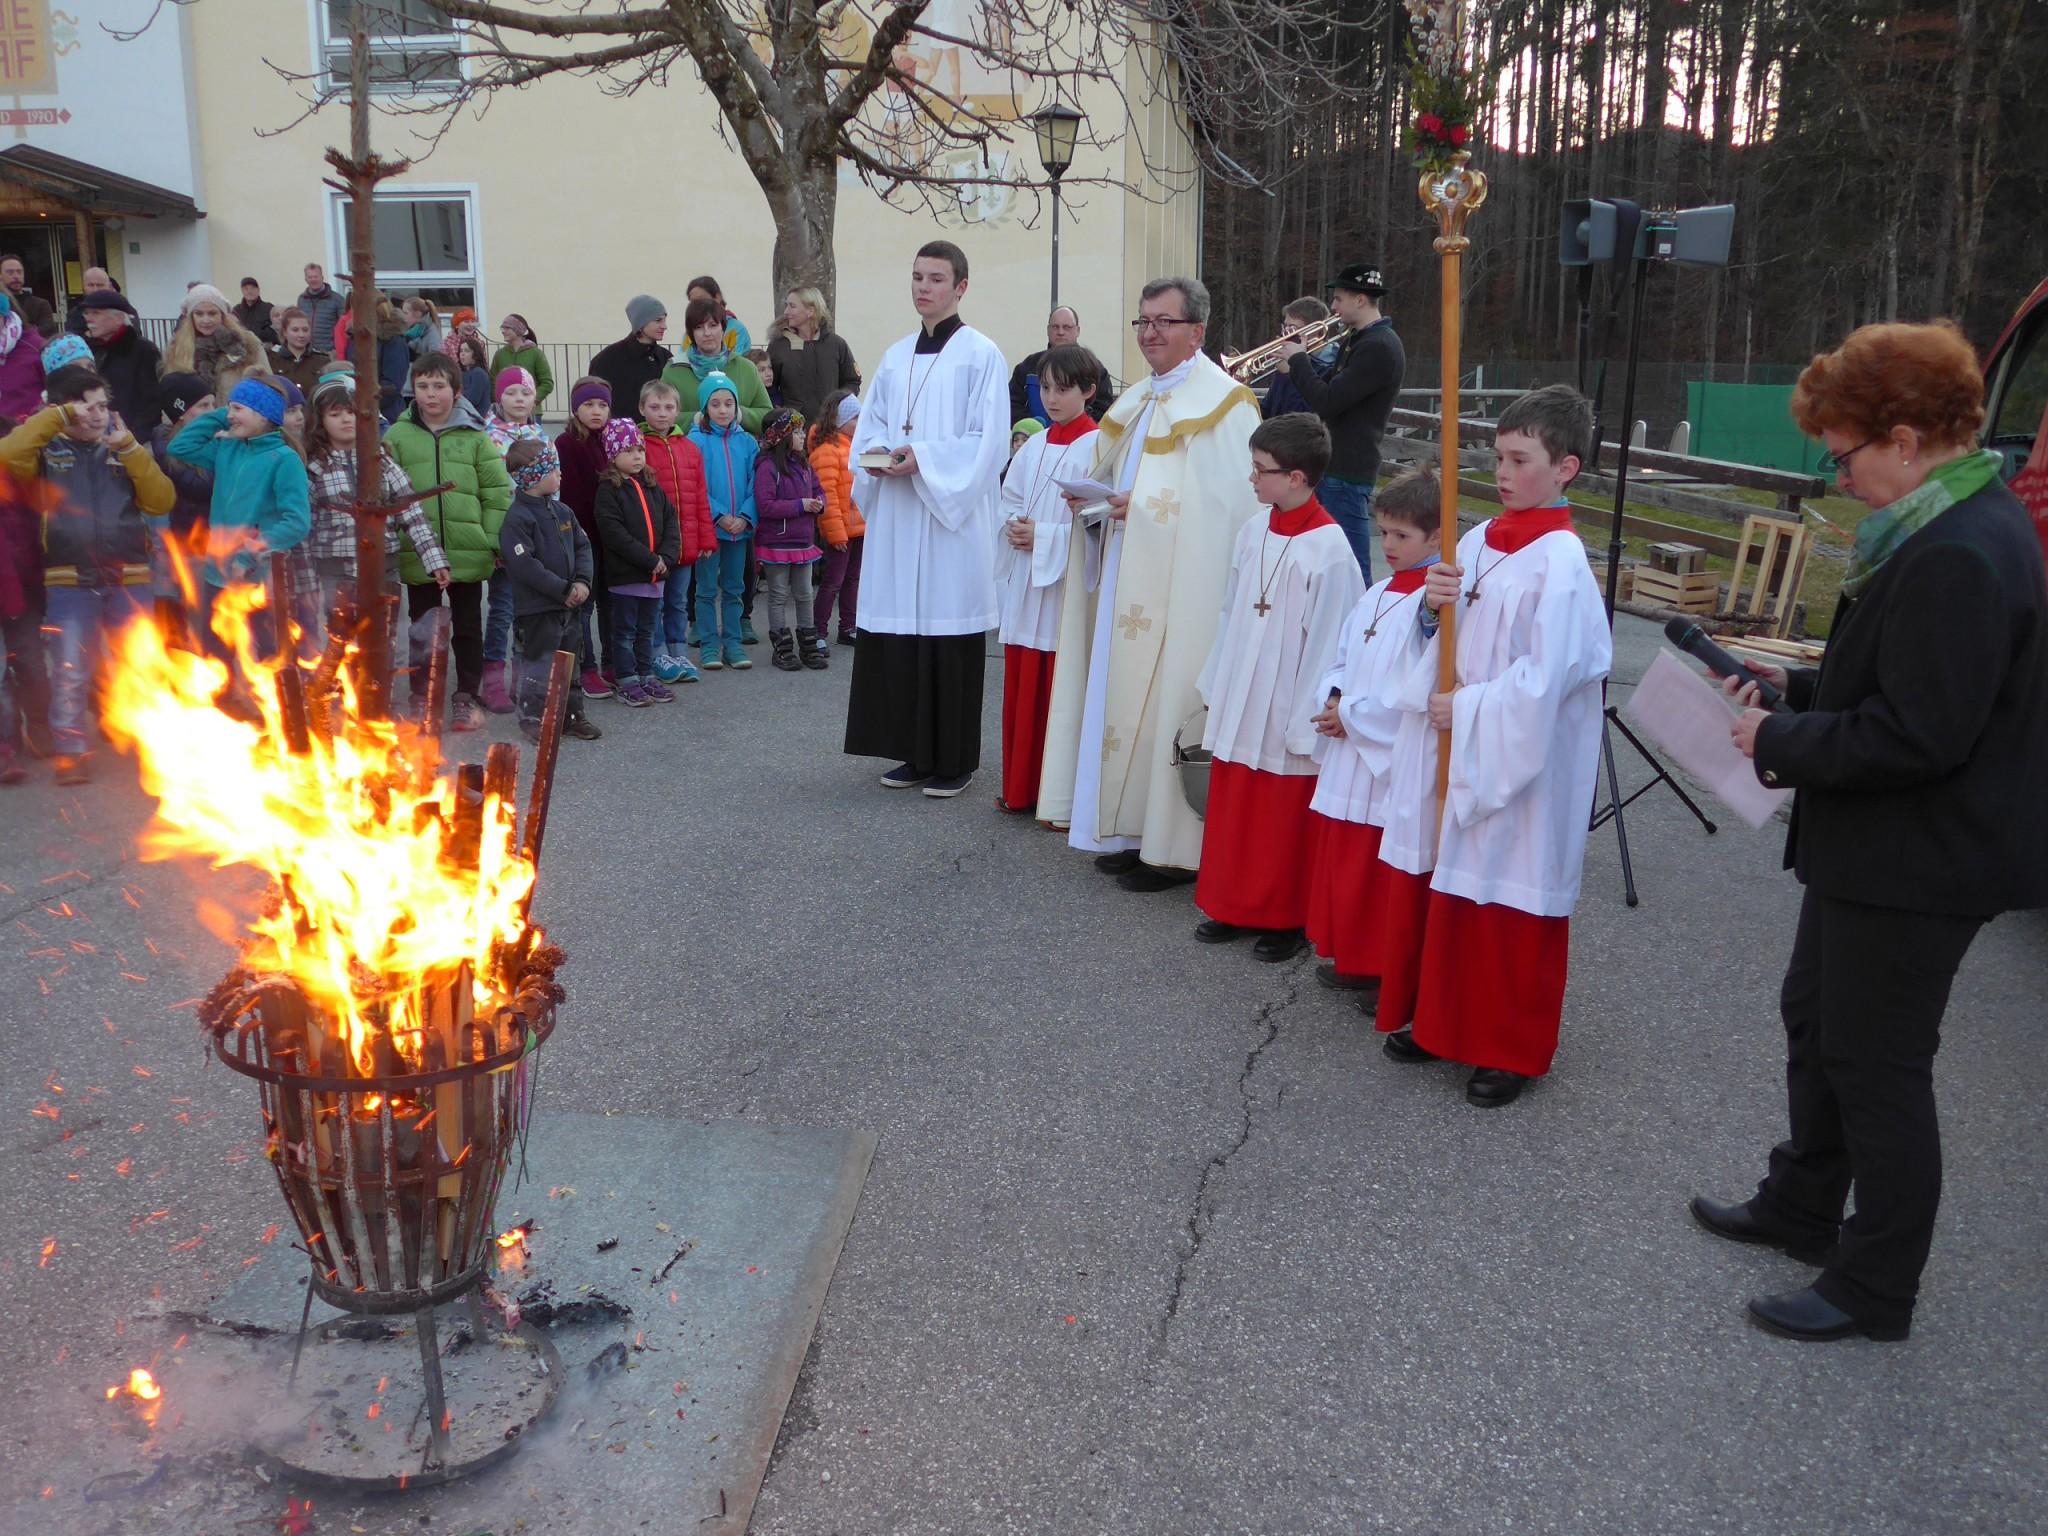 Beginn der Osterlichtfeier